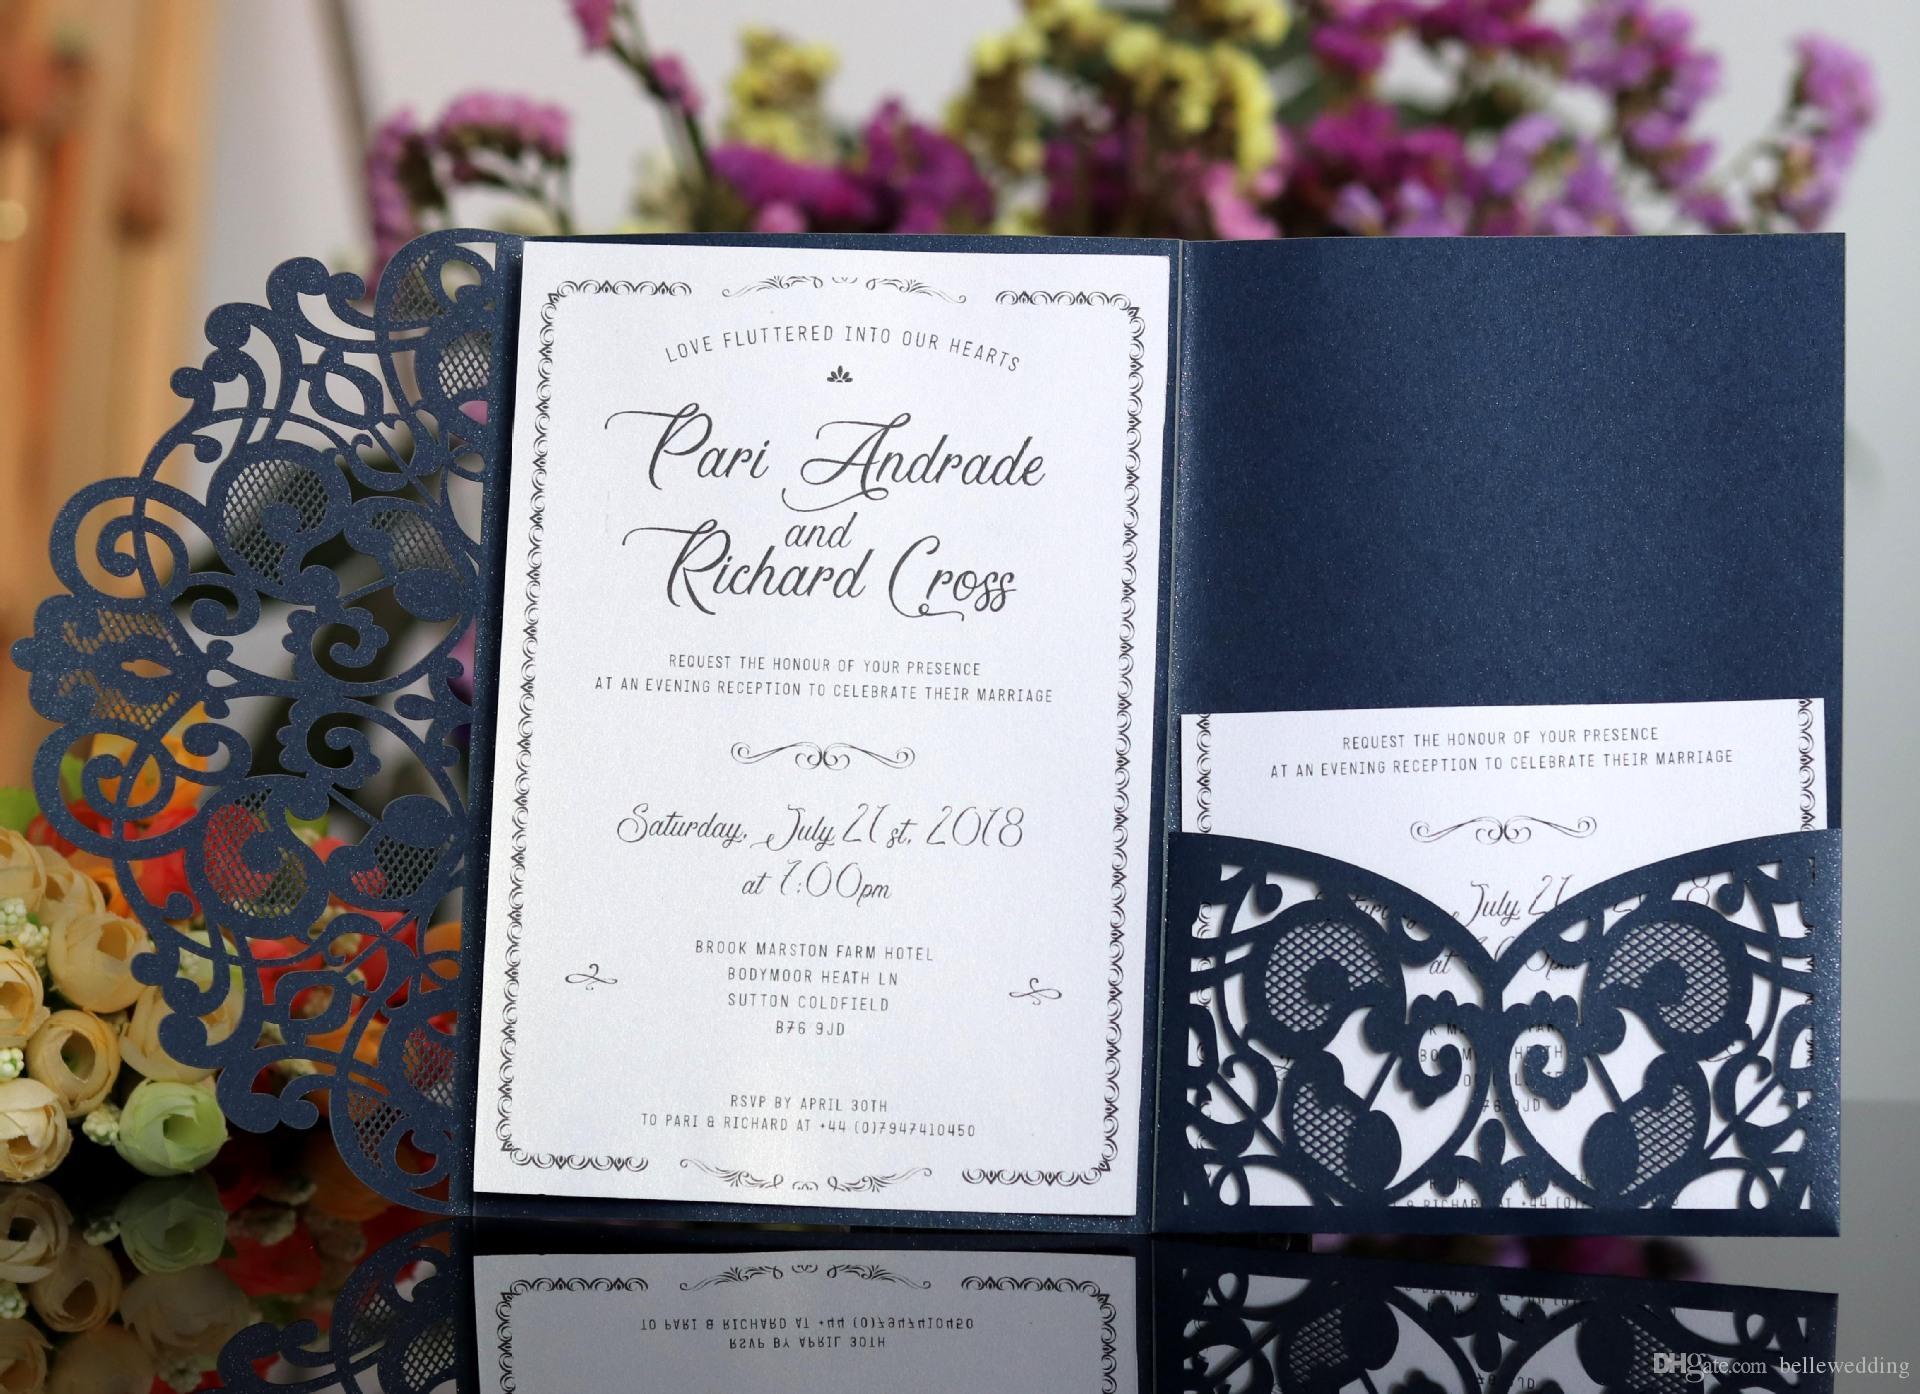 Laser Cut Wedding Invitations OEM In Customized Hollow Folding Personalized  Wedding Invitation Cards BW HK119 Cheap Wedding Invitations Online  Christian Wedding Invitation Wording From Bellewedding, $0.71| DHgate.Com